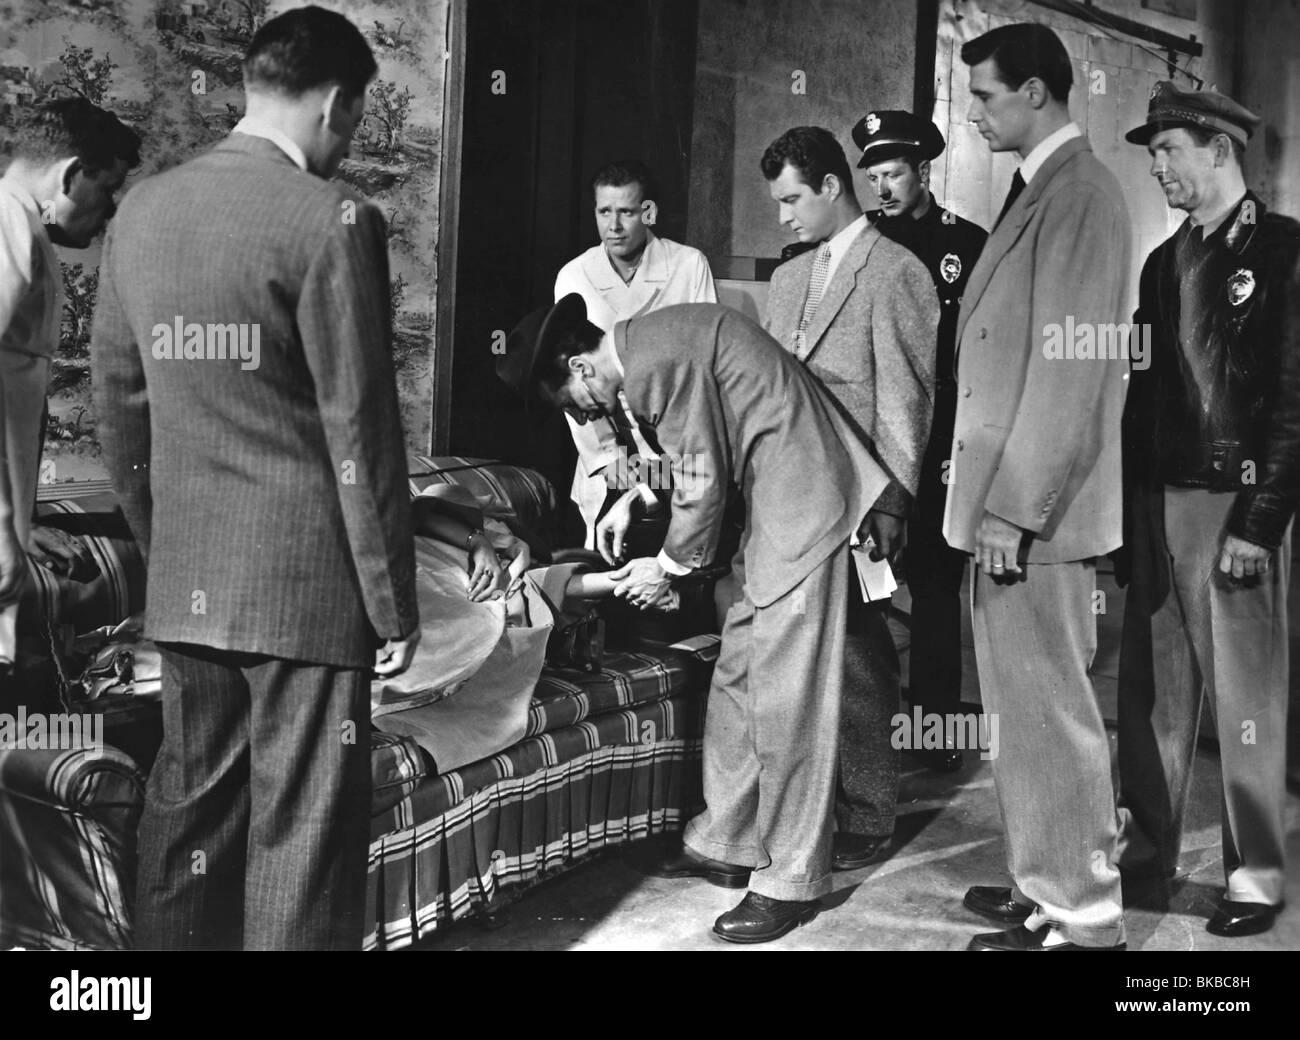 JAIL BAIT -1954 - Stock Image